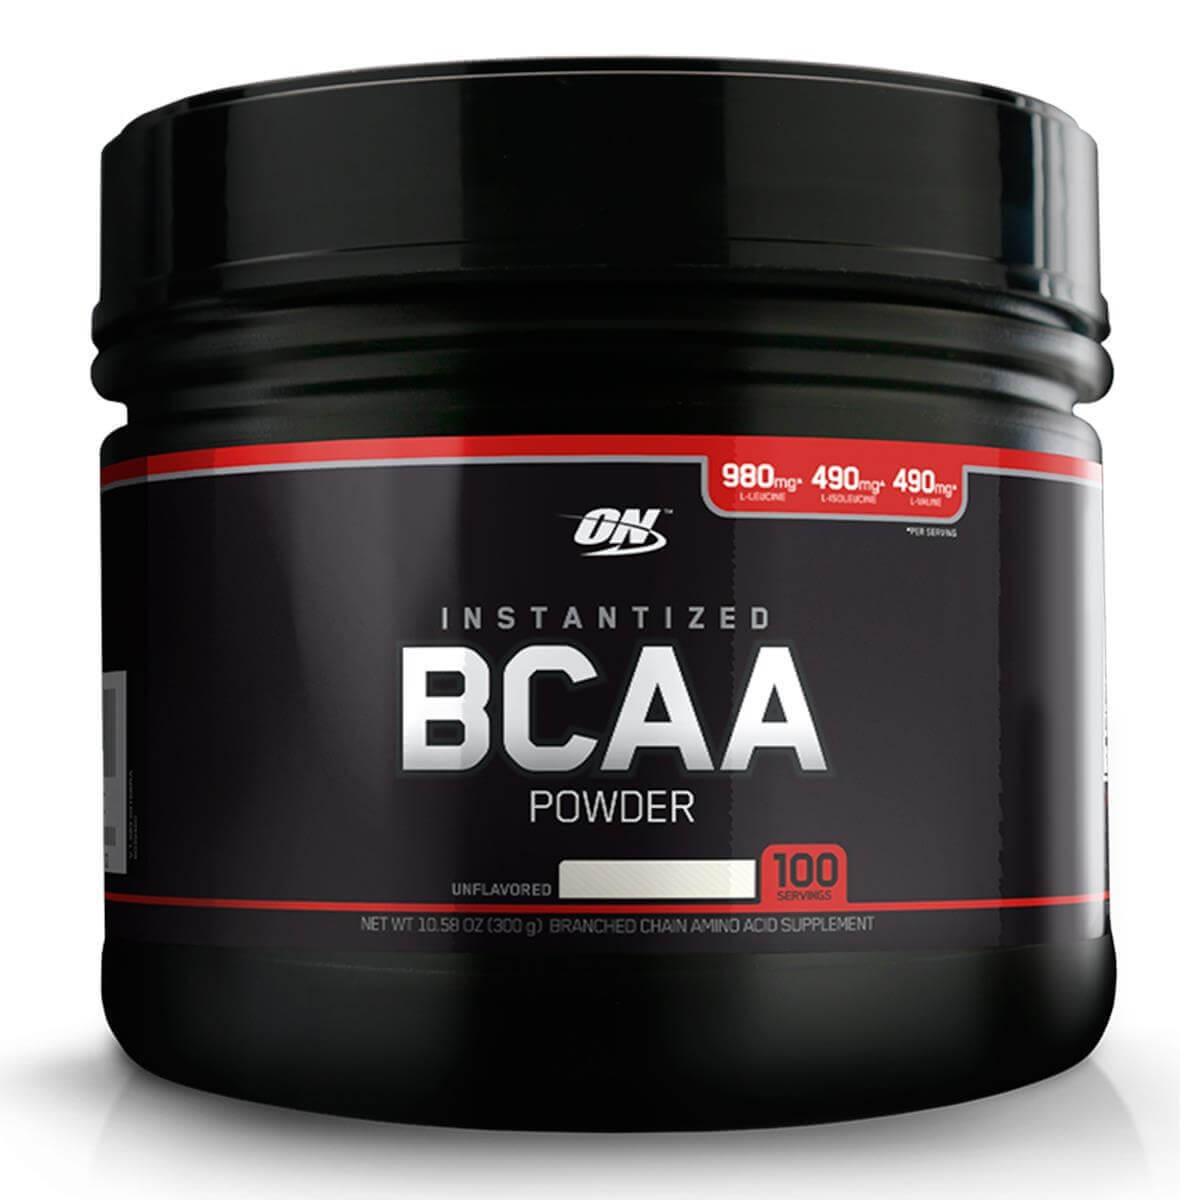 BCAA Powder Black Line Optimum Nutrition - 300g